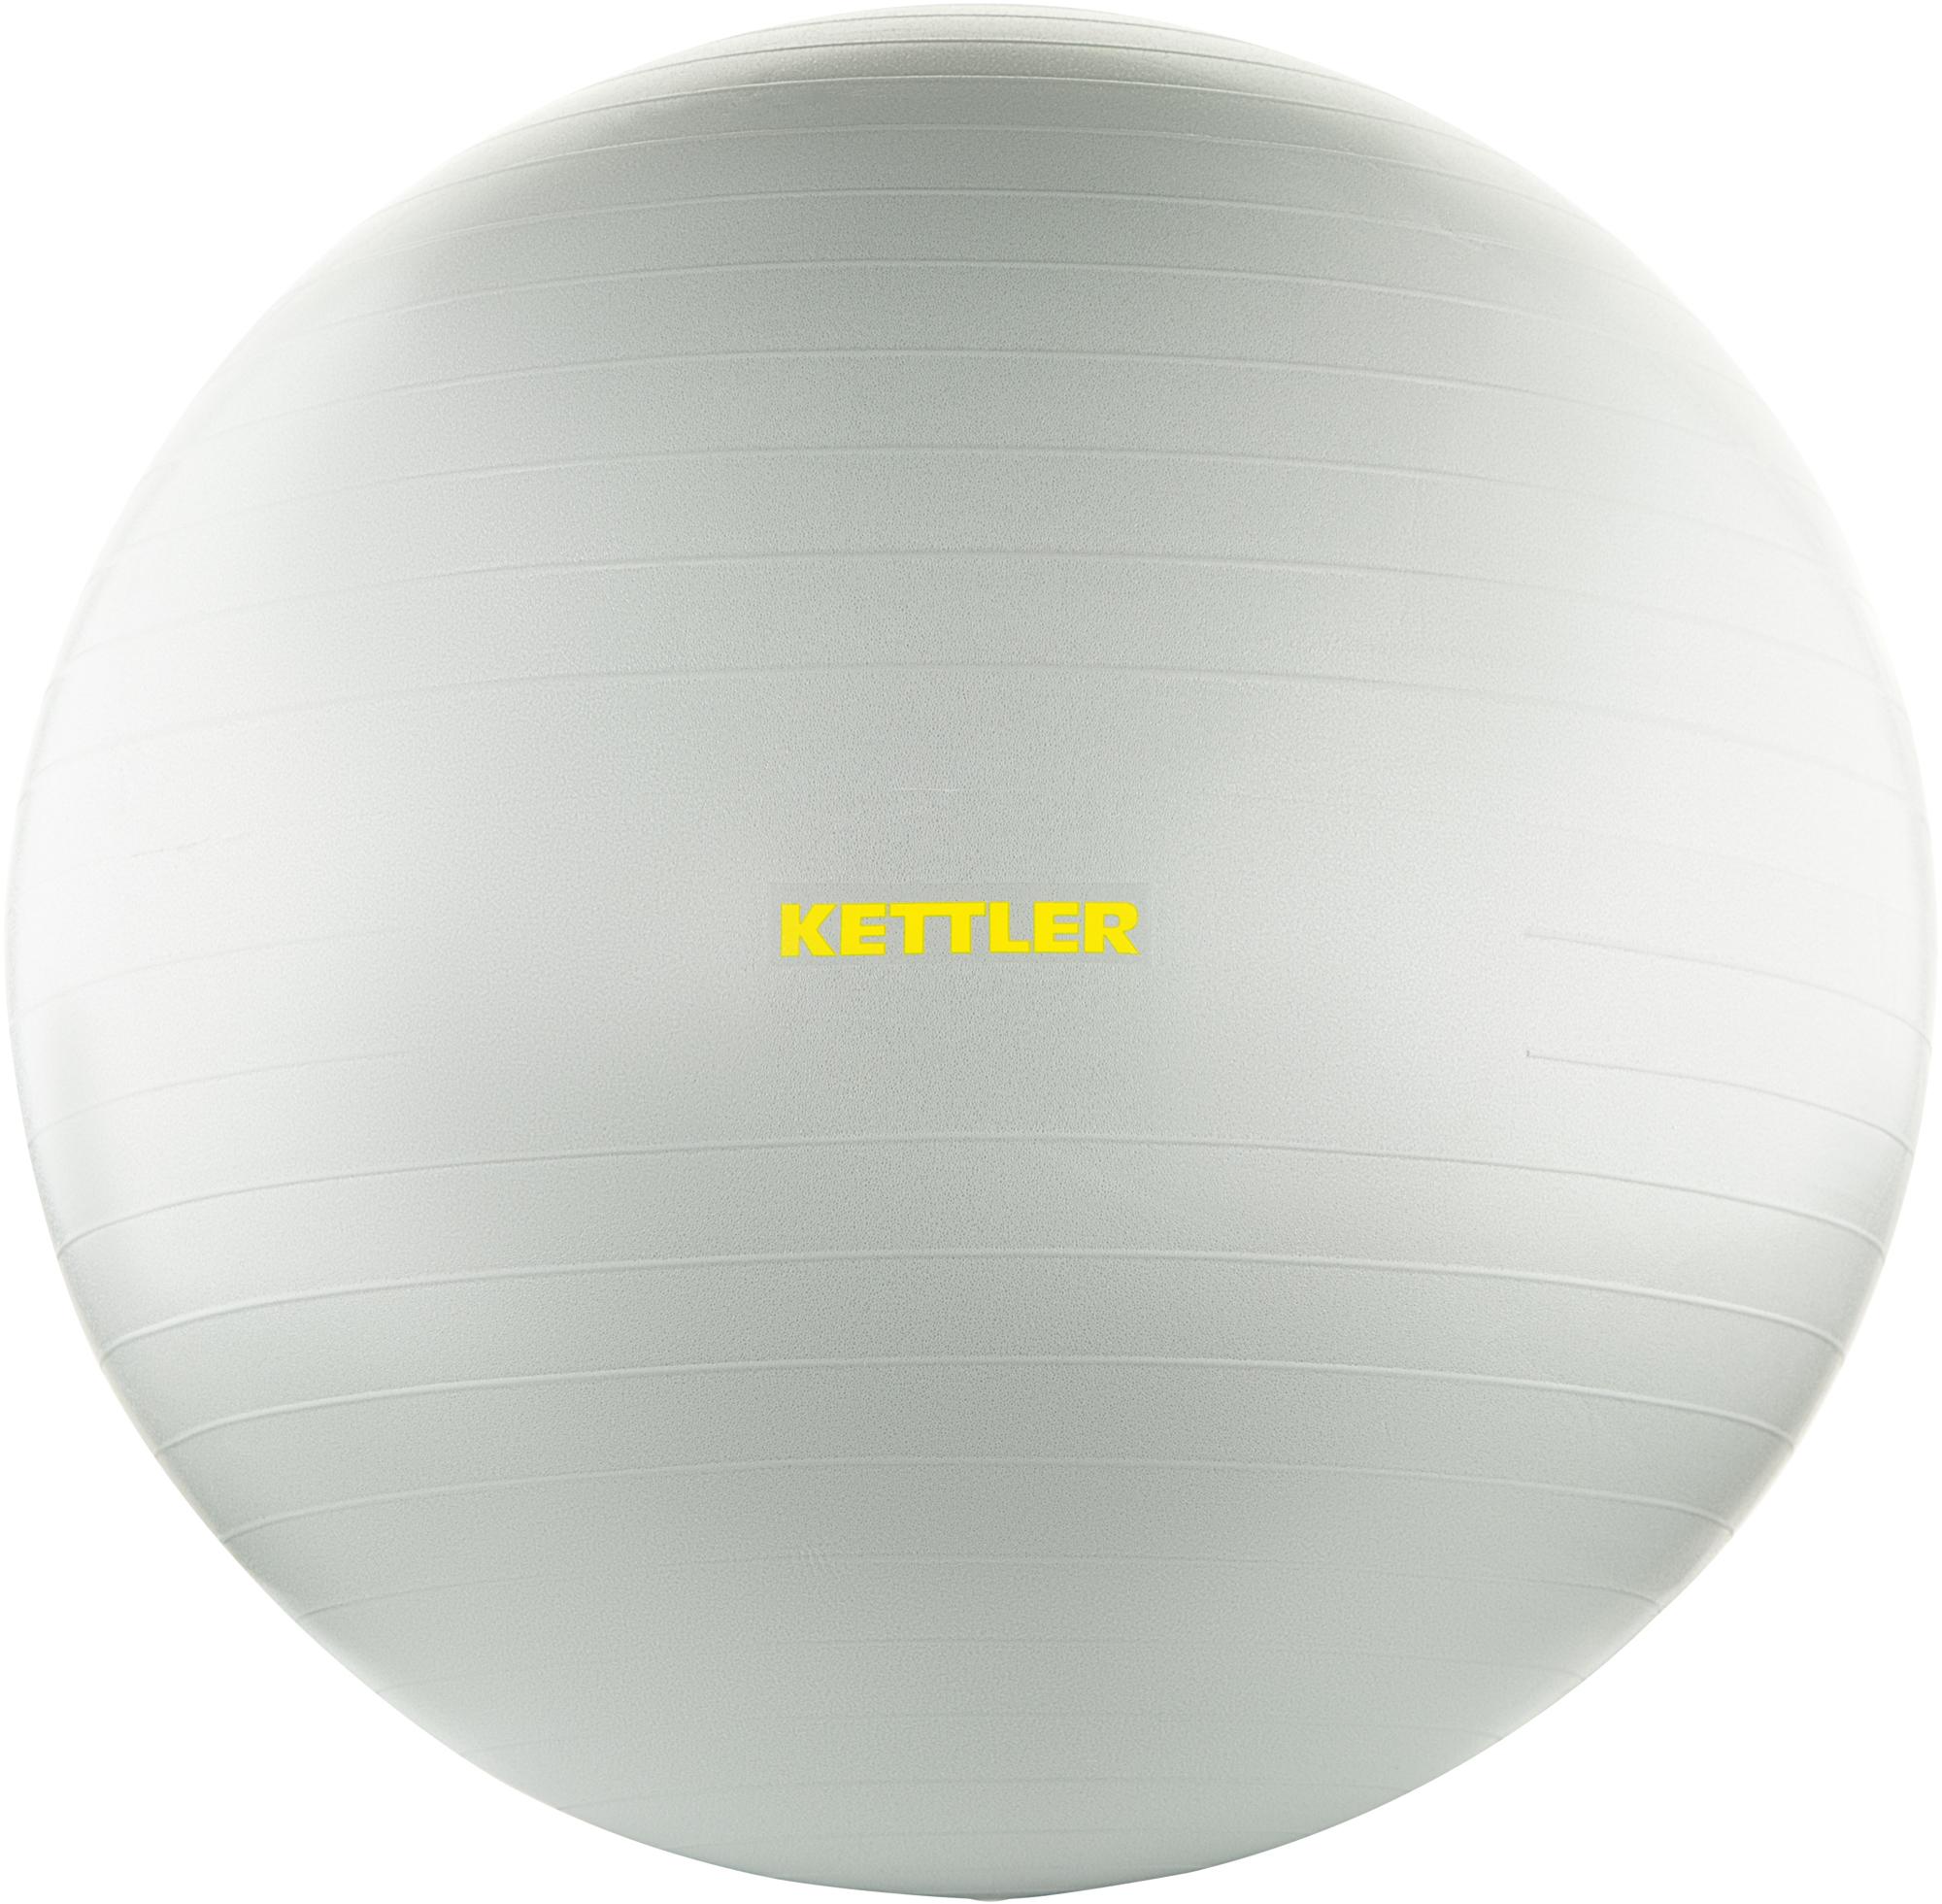 Kettler Мяч гимнастический Kettler, 65 см